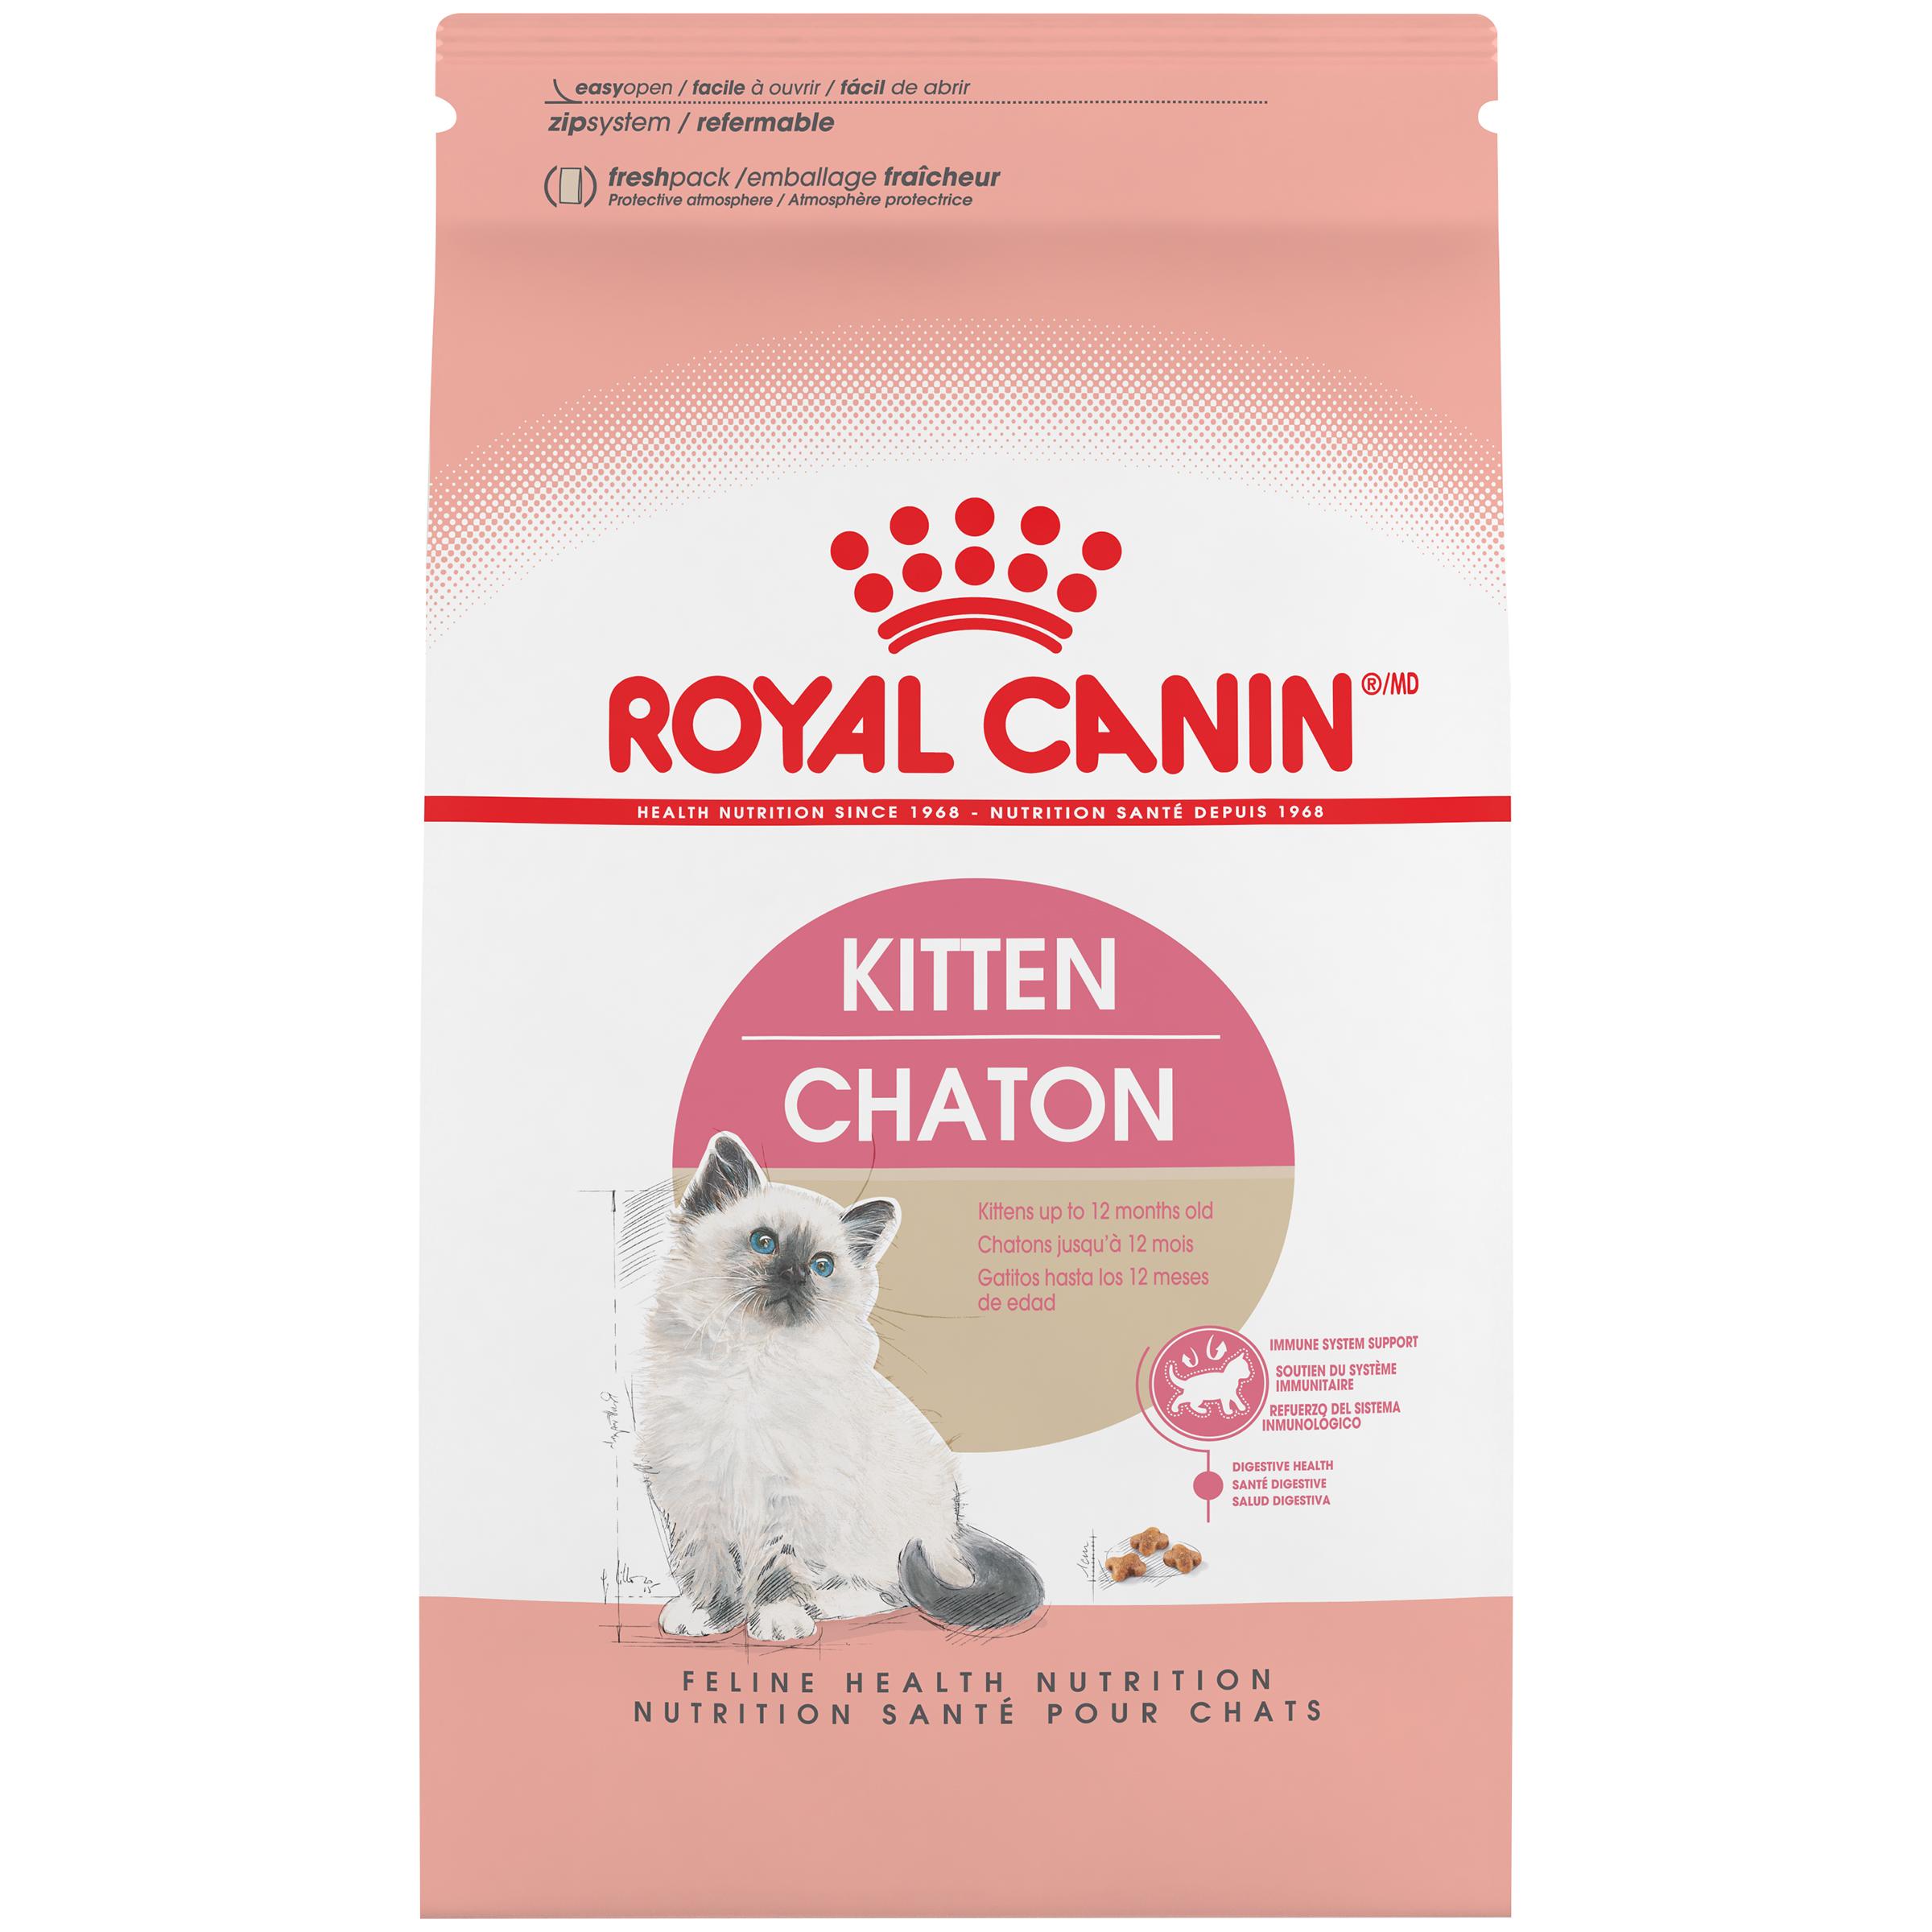 Royal Canin Kitten Dry Cat Food Image